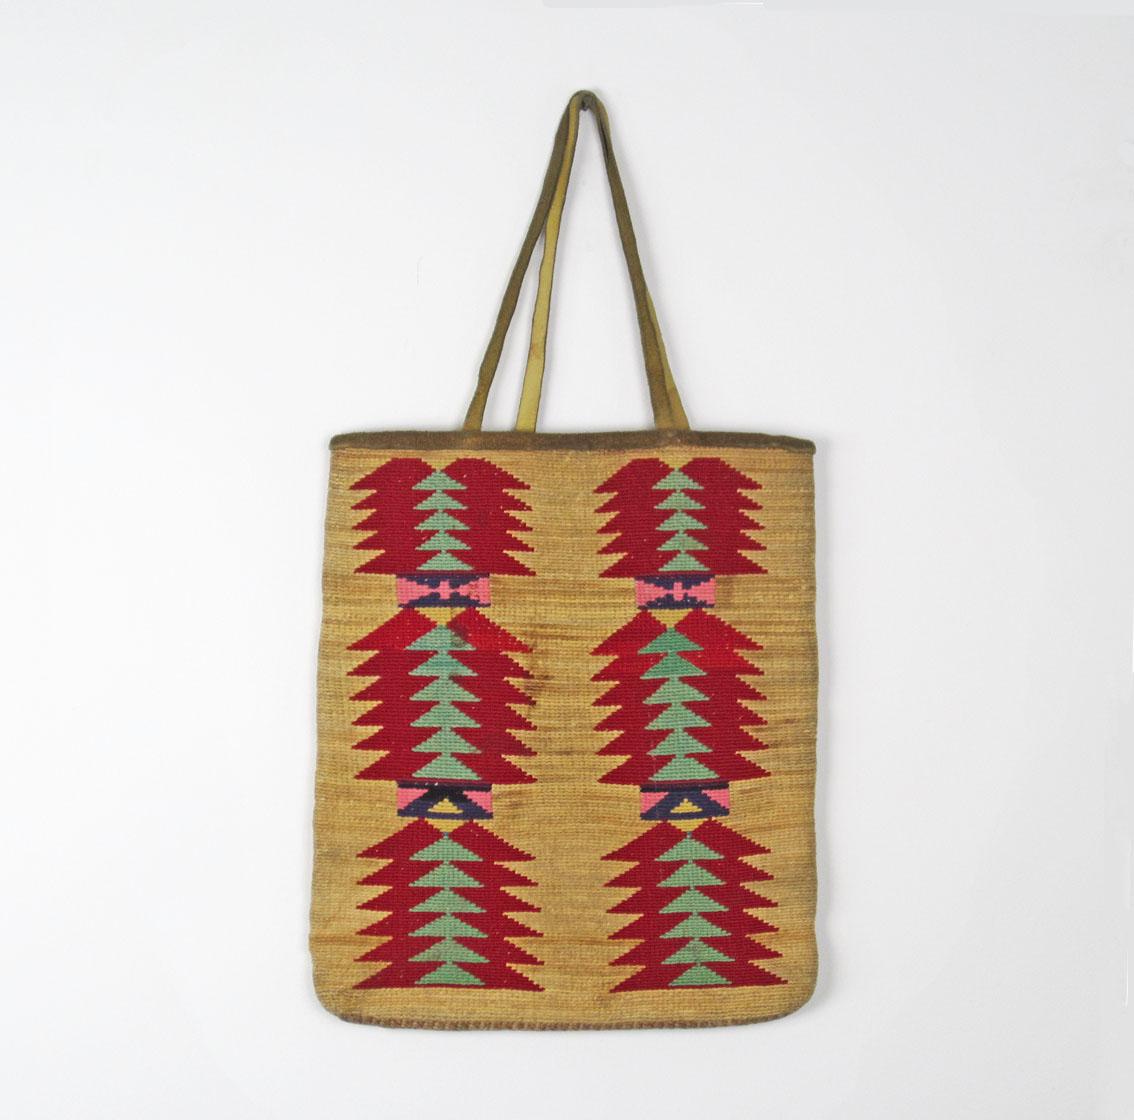 http://www.marcyburns.com/baskets-collection/ksyb7xih7akl21h7daucpanafkrdsz